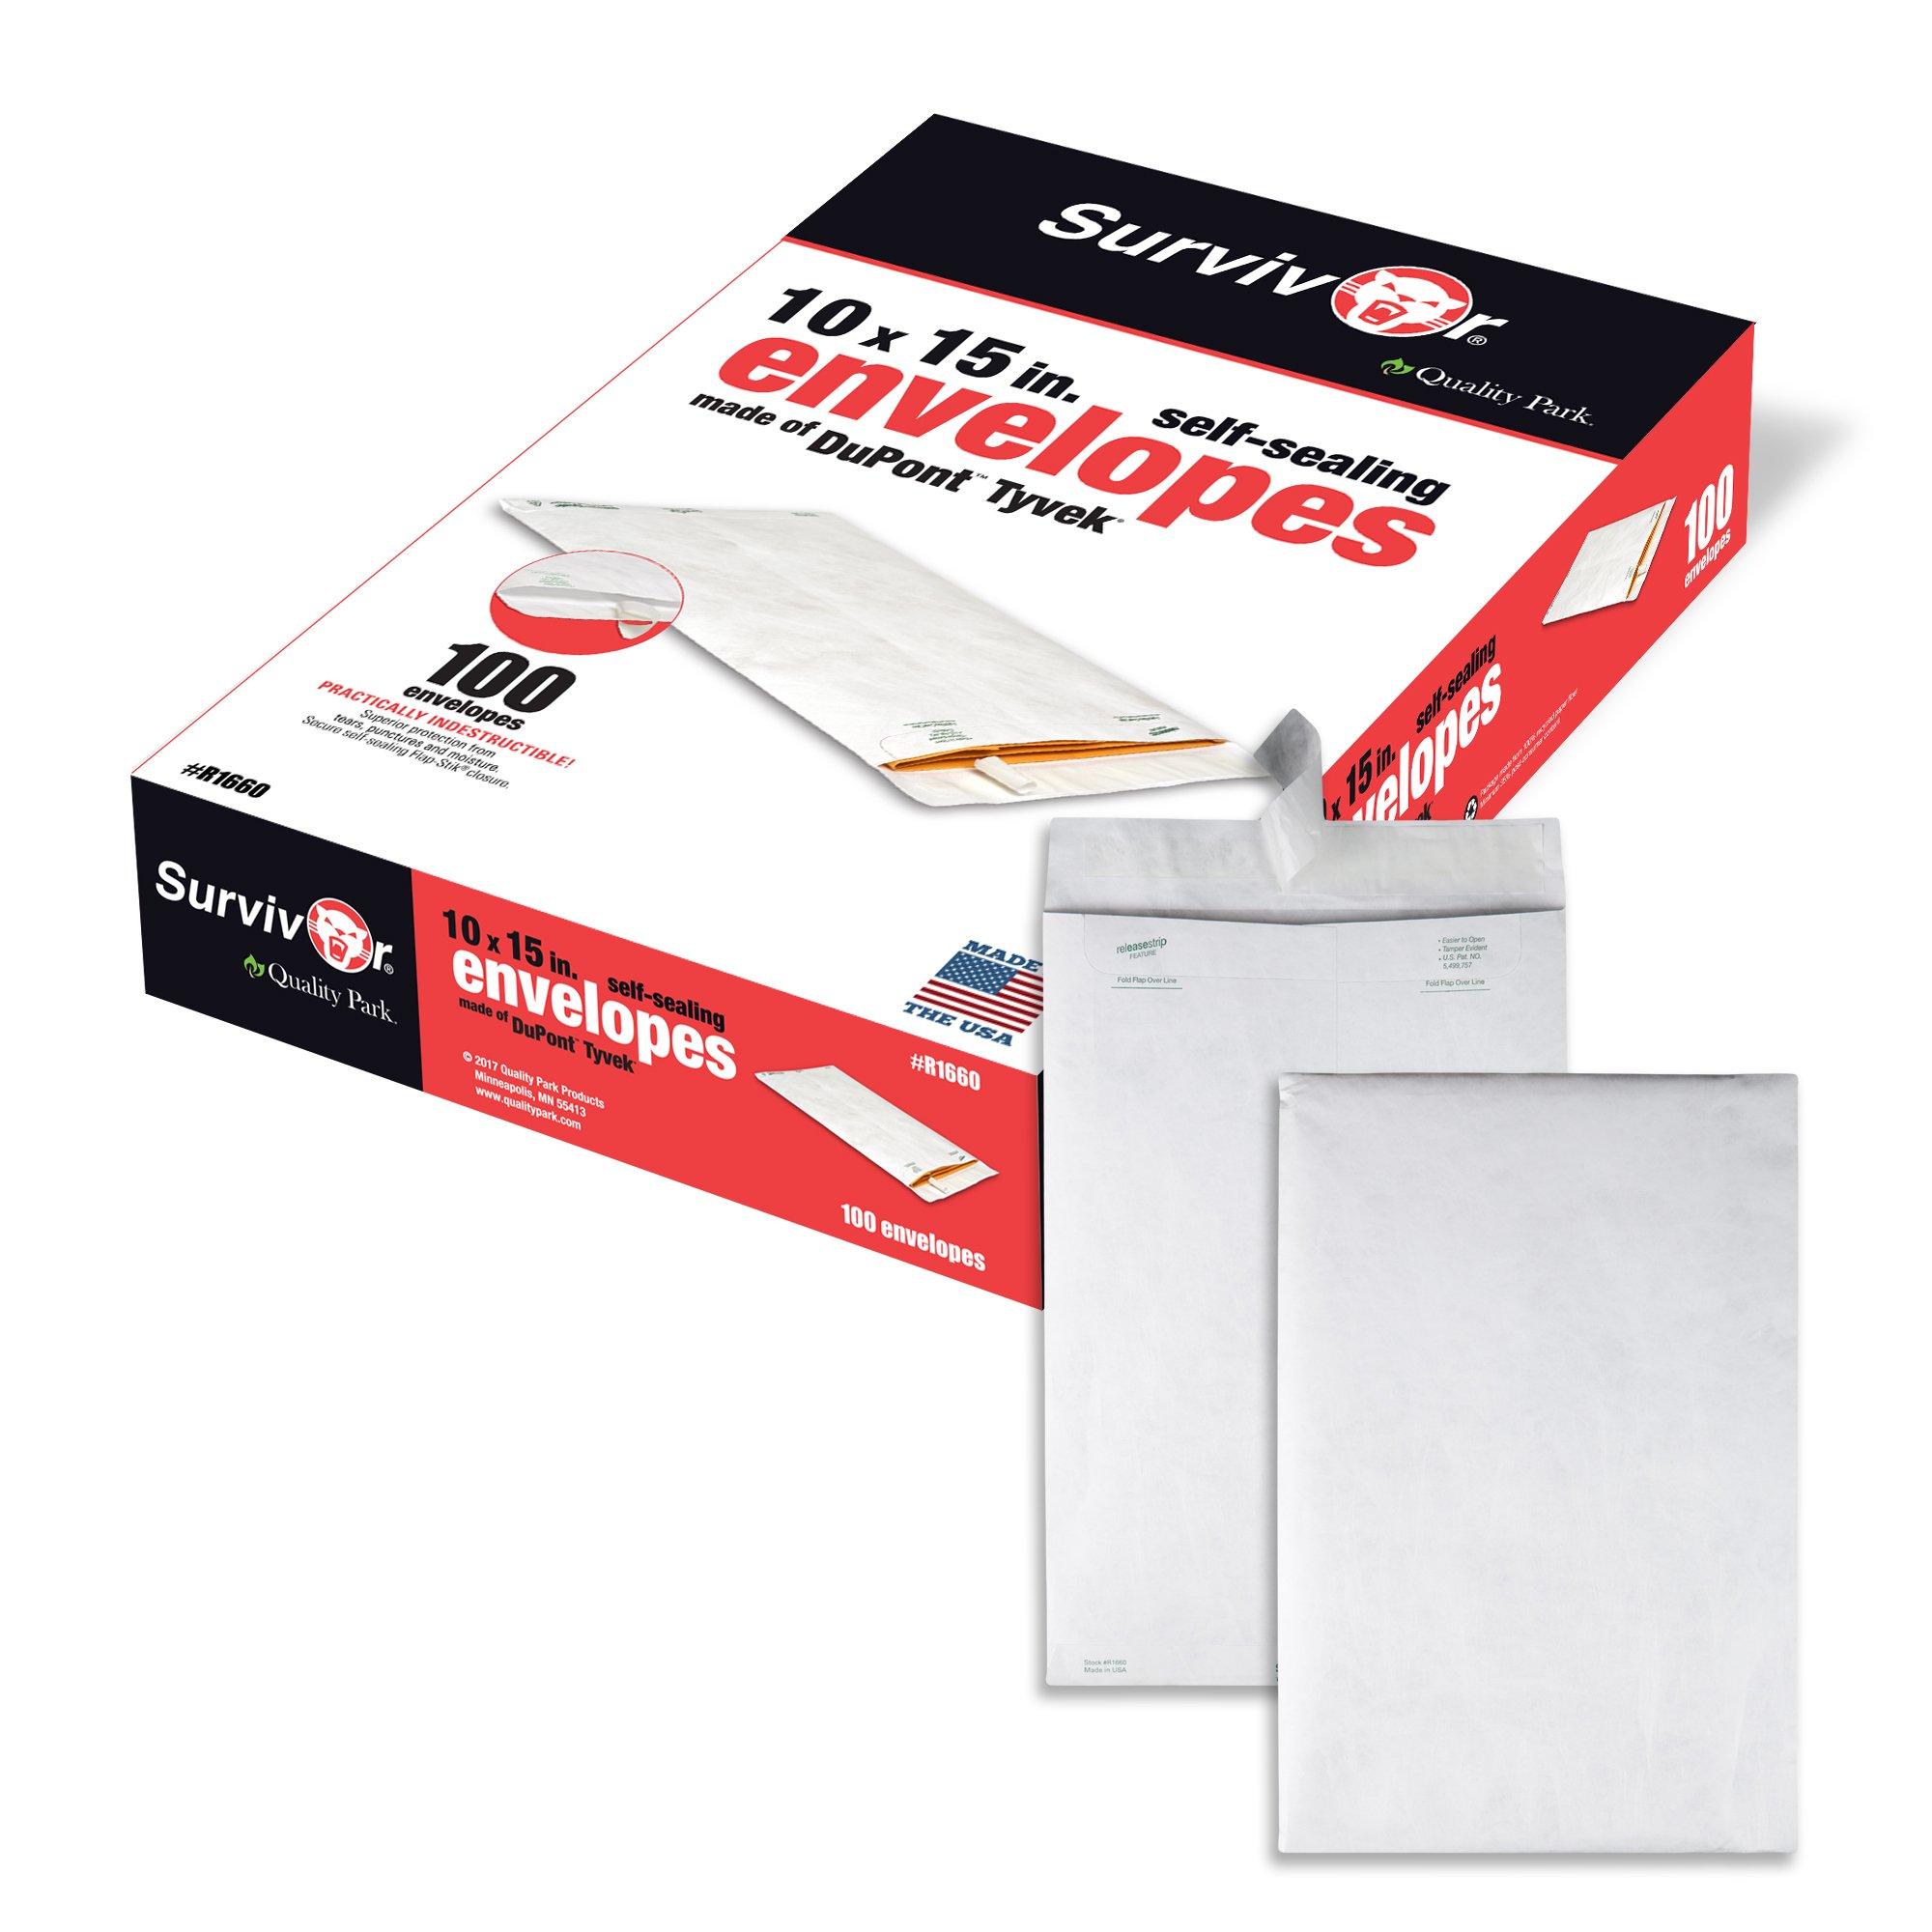 Quality Park QUAR1660 Survivor 10 x 15 Tyvek Catalog Mailer with Self Sealing Closure, 14 lb Puncture, Tear and Moisture Resistant DuPont Tyvek Envelopes, 100 per Box (R1660)